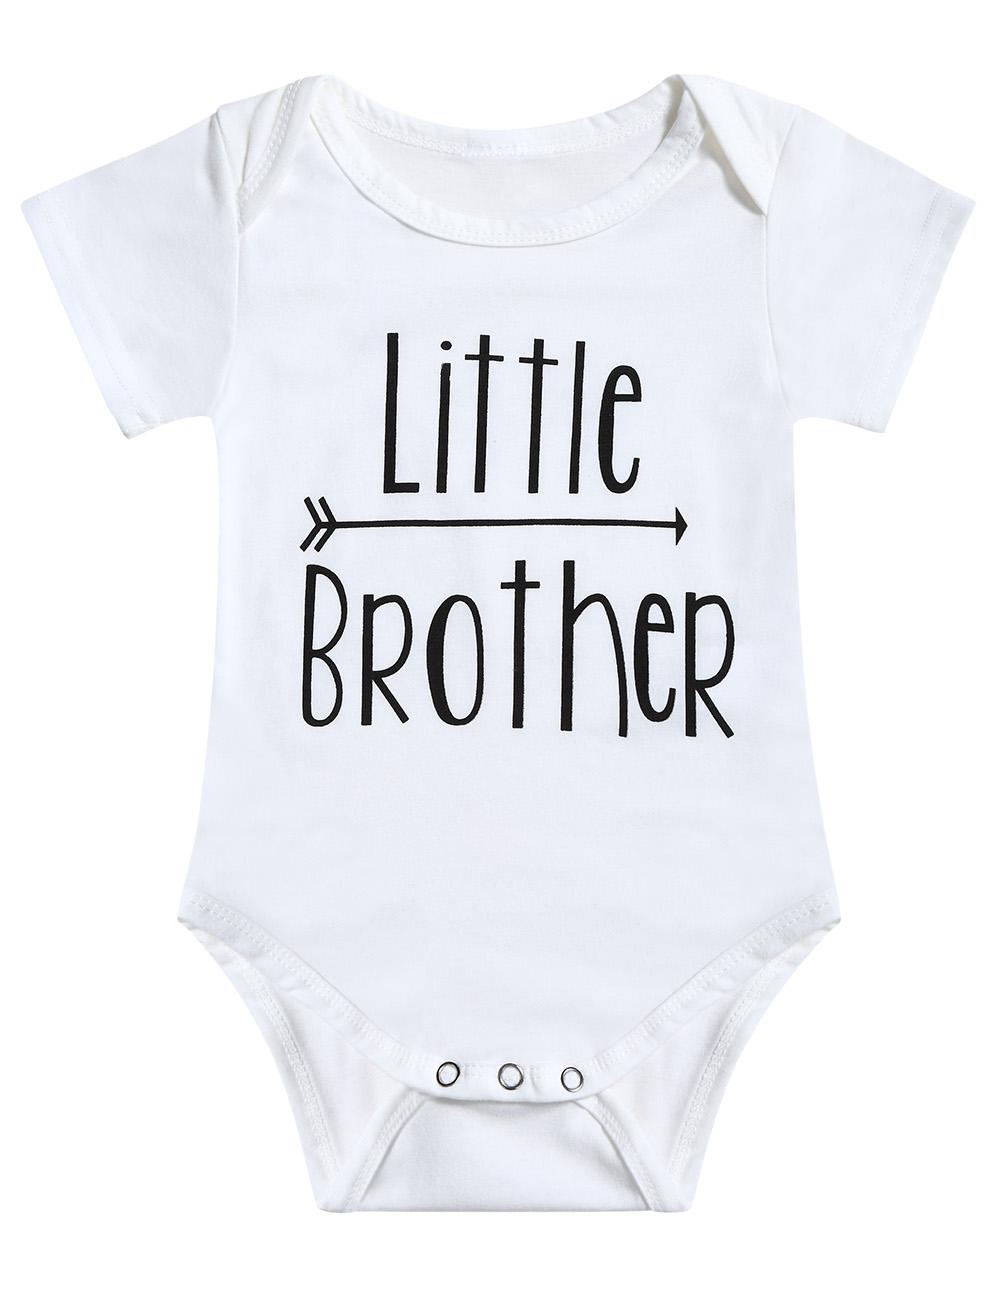 Boys Short Sleeve Round Little Brother&Big Brother Print T-shirt Snap Closure Romper 2pcs Cloth Set